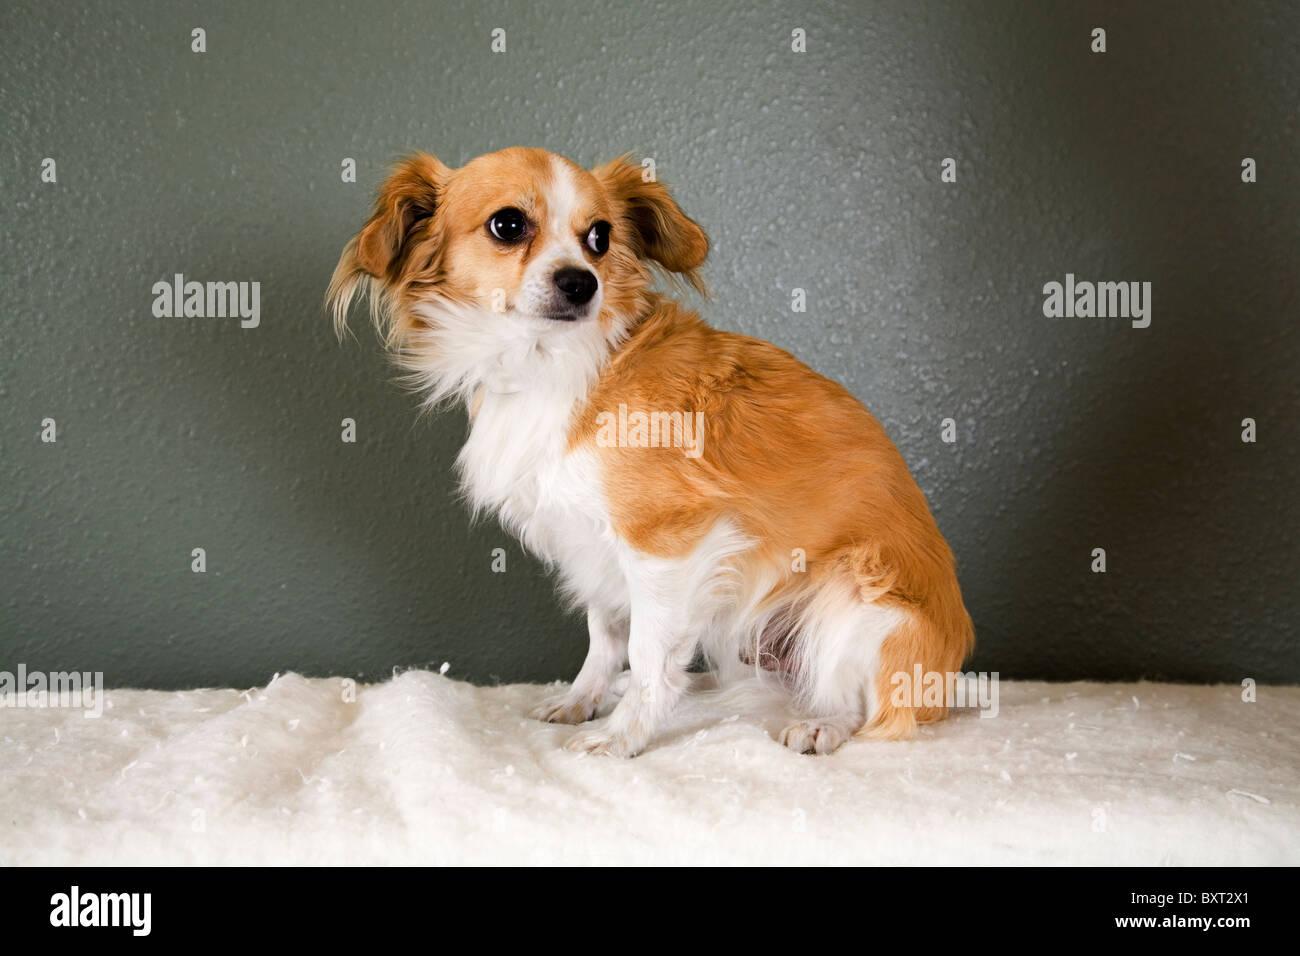 A Pekinese and Chihuahua cross dog - Stock Image